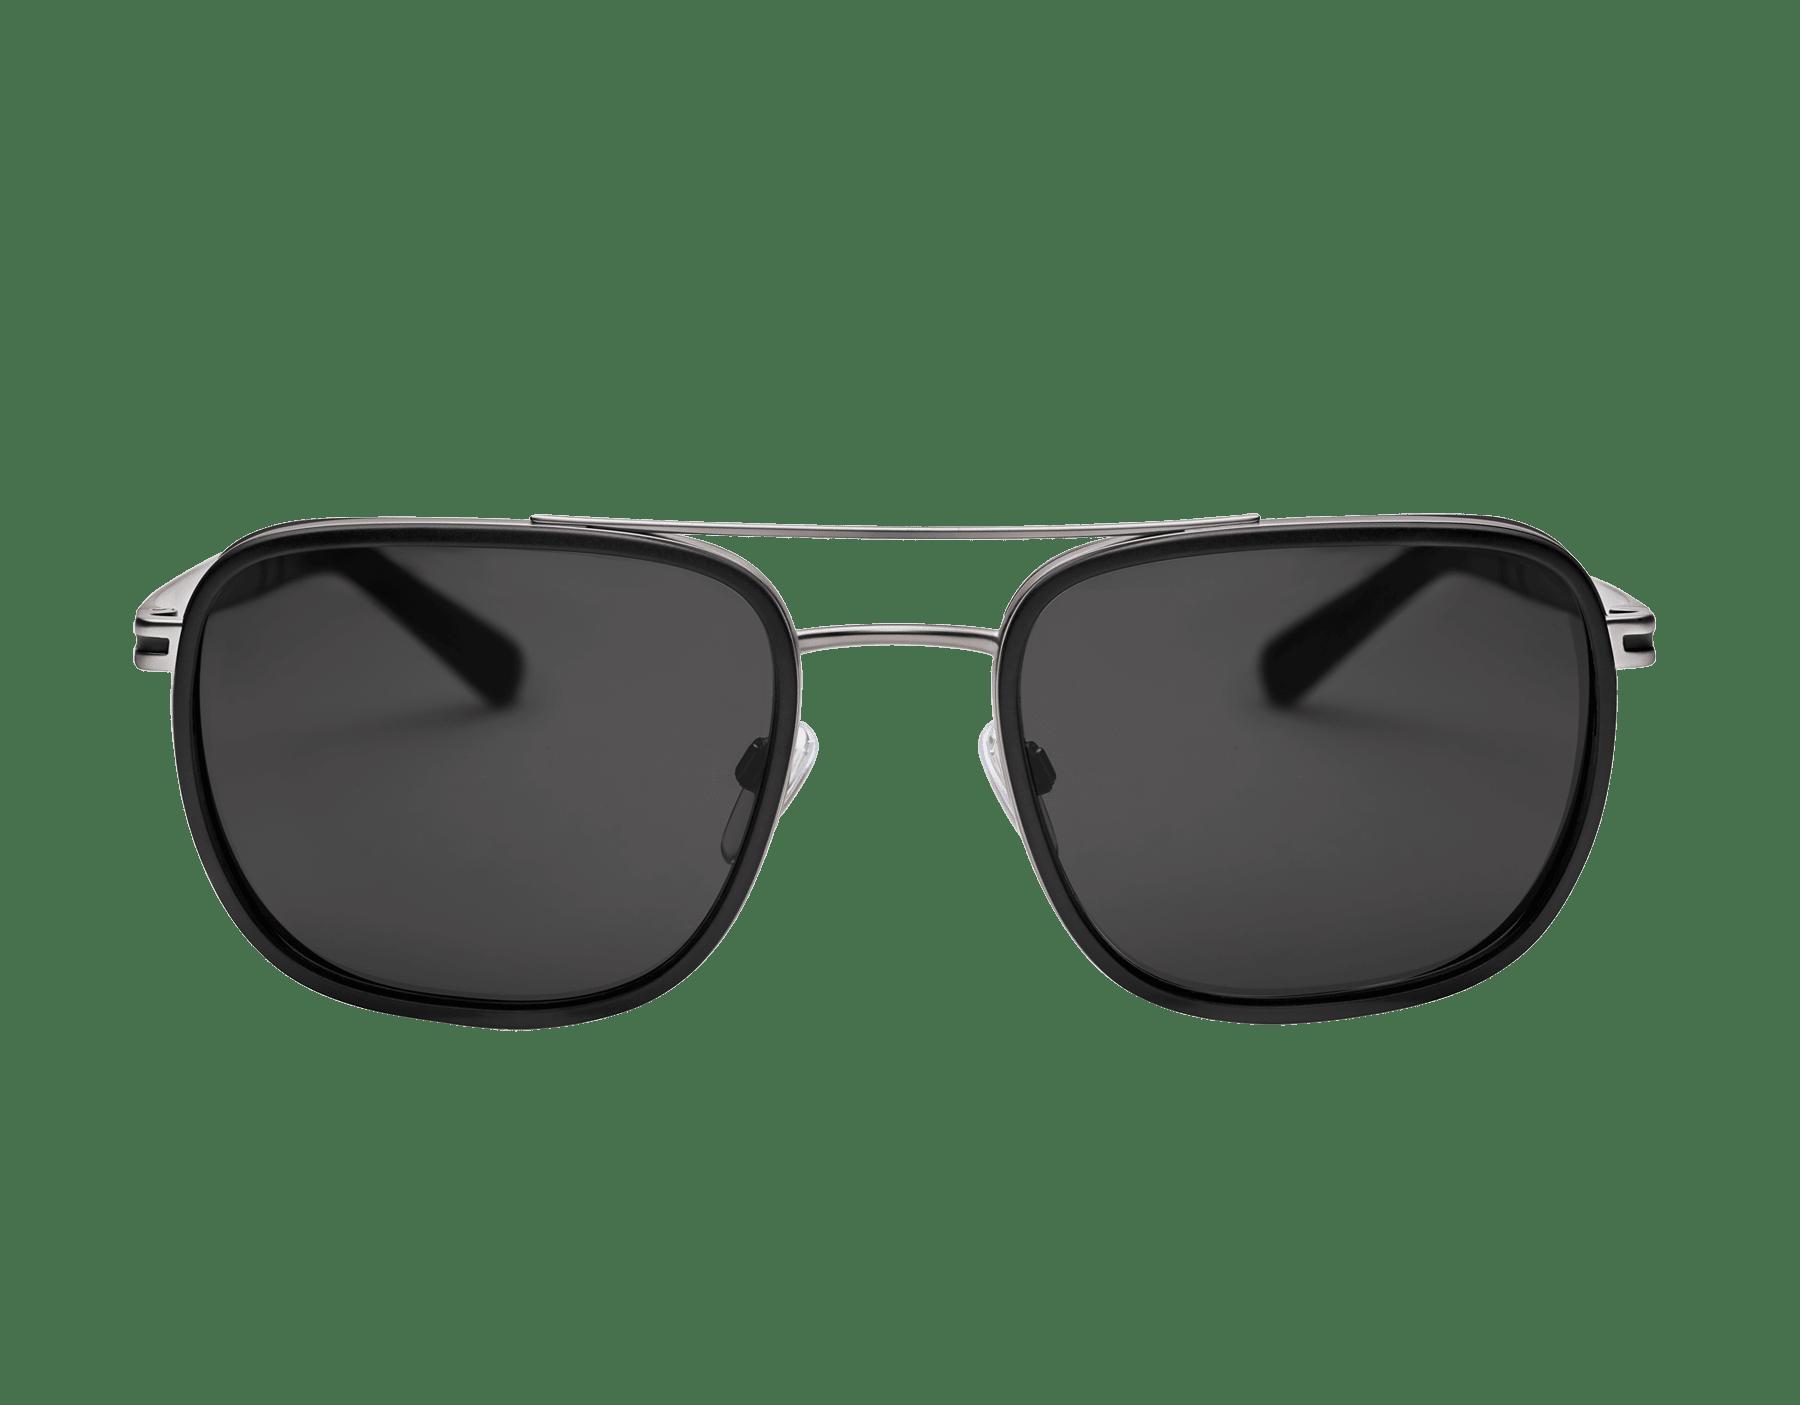 Óculos de sol Bvlgari Bvlgari formato retangular com ponte dupla em metal. 904082 image 2